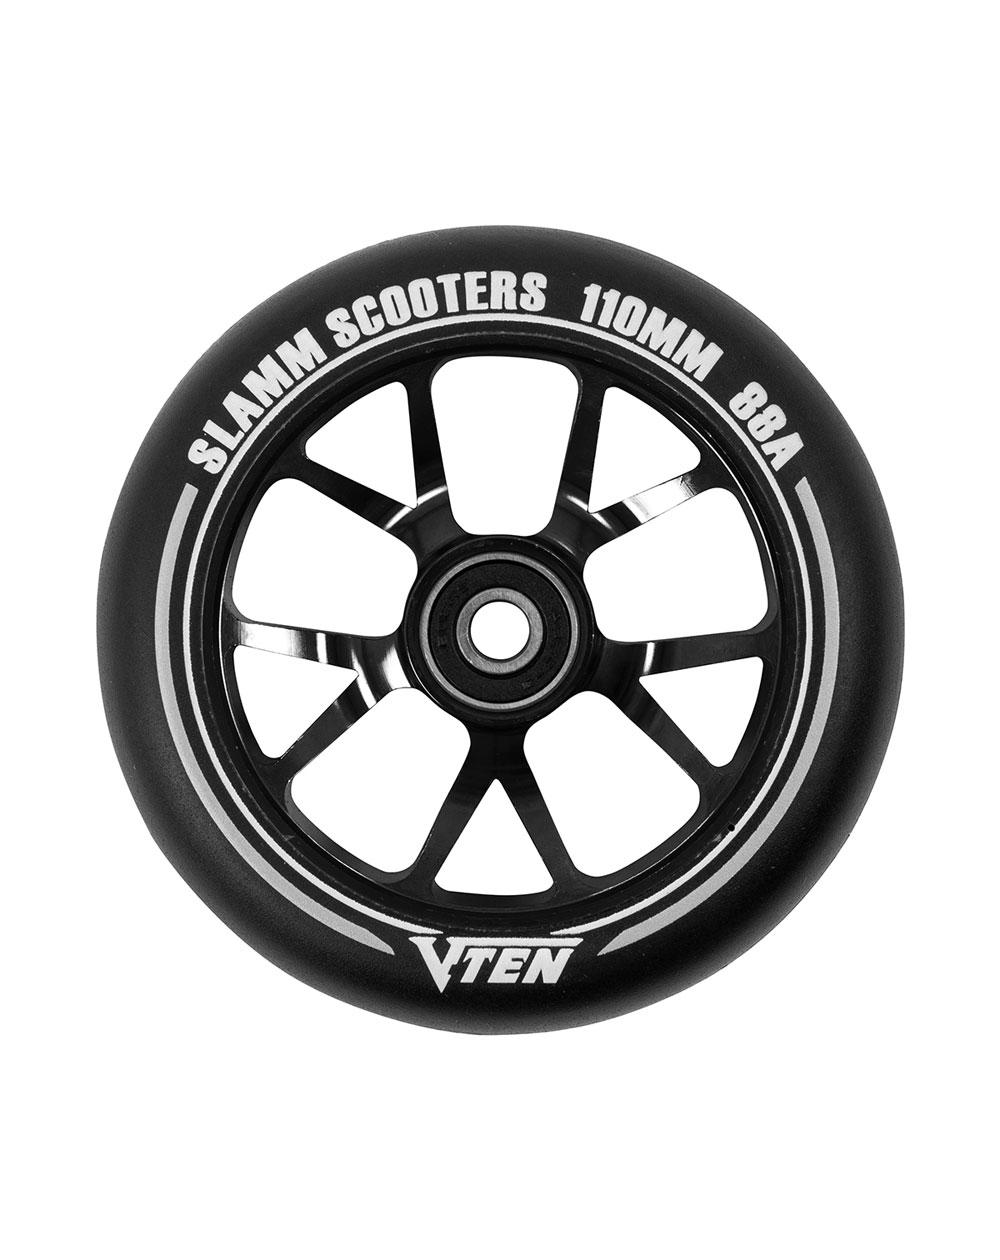 Slamm Scooters Ruota Monopattino V-Ten II 110mm Black